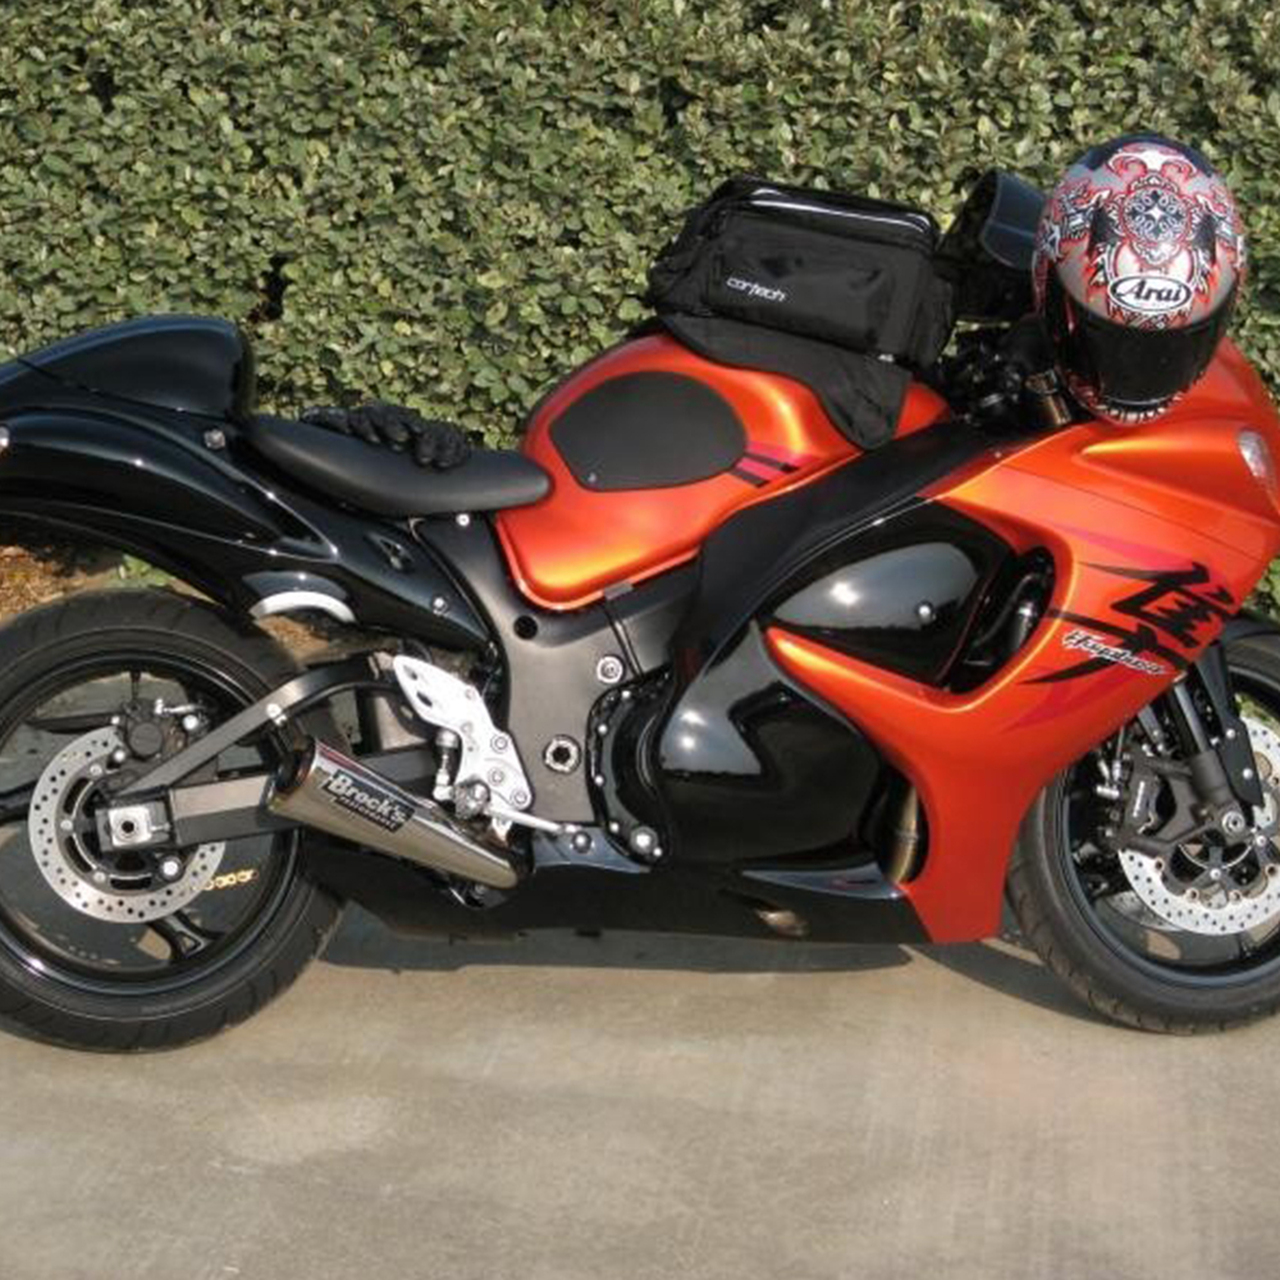 Suzuki Keyring Keychain Motorcycle Motorbike Present Gift GSX 125 R600 Hayabusa